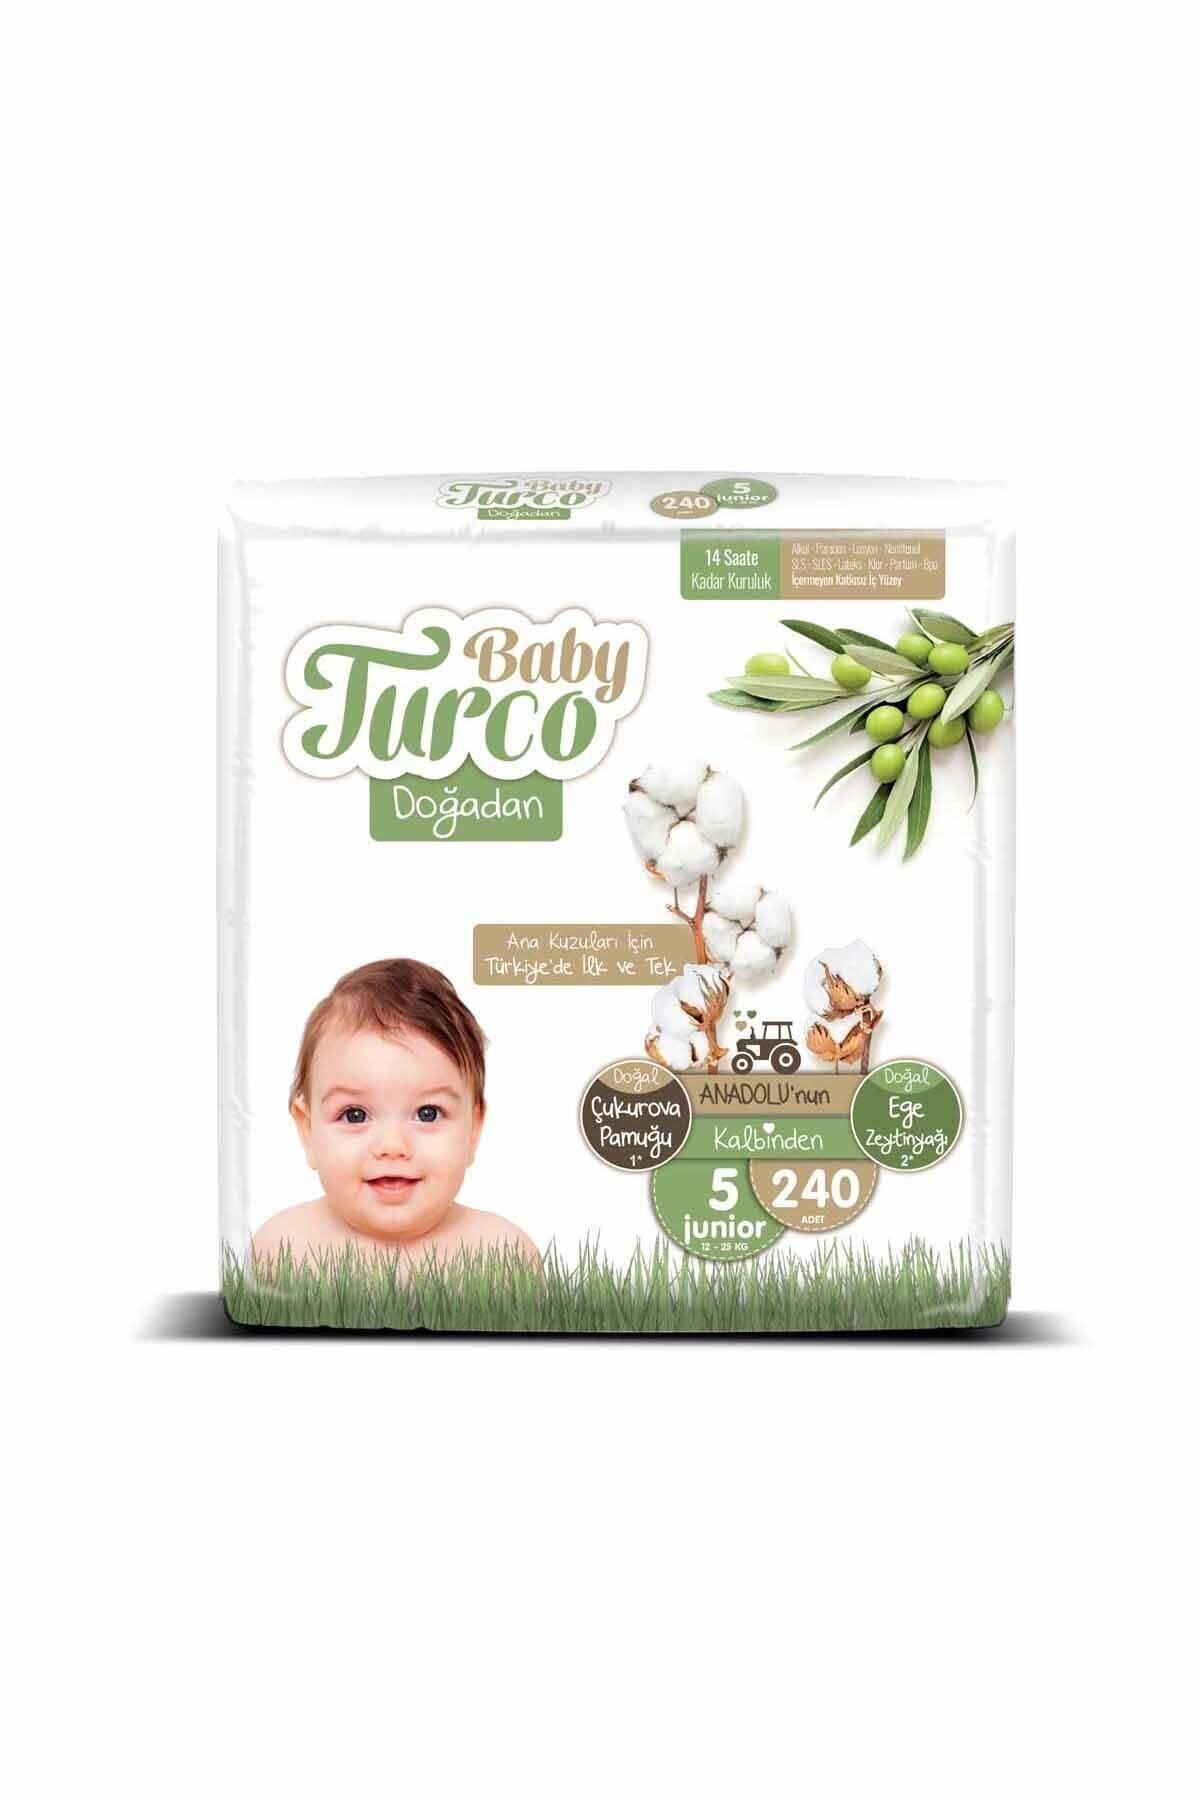 Baby Turco Doğadan 5 Numara Junıor 240 Adet 2